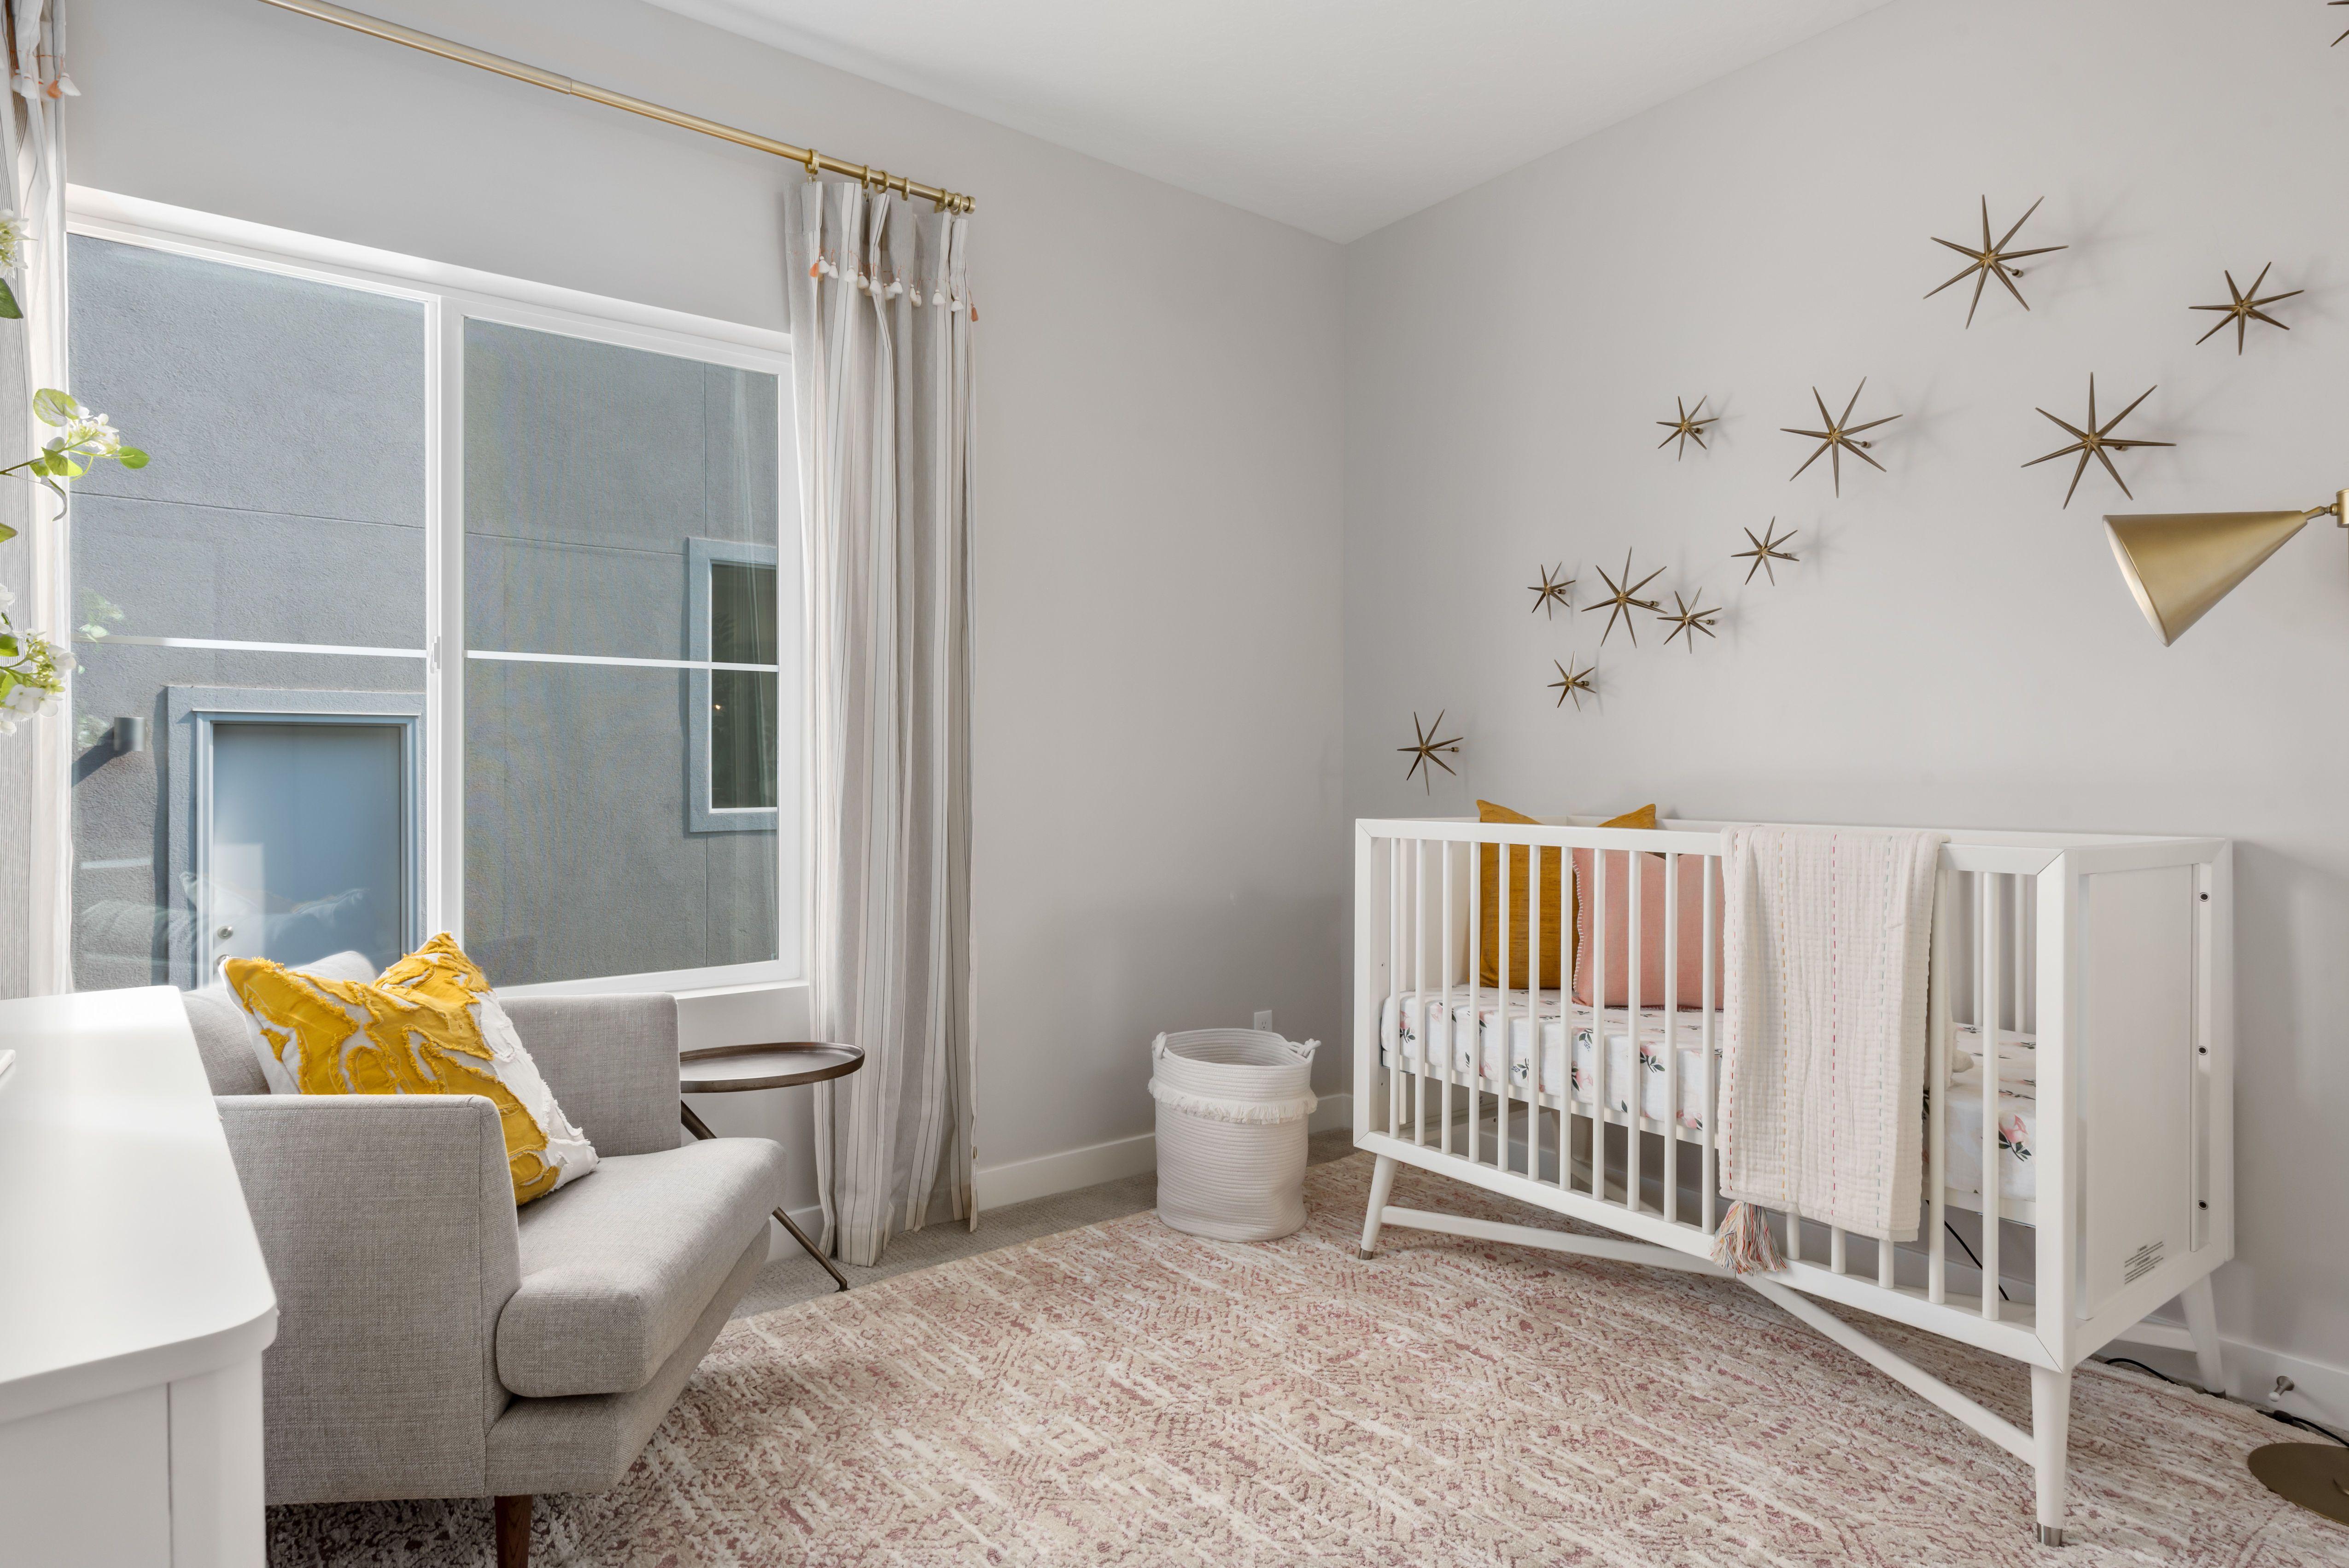 Bedroom featured in the Bellows By Garbett Homes in Salt Lake City-Ogden, UT